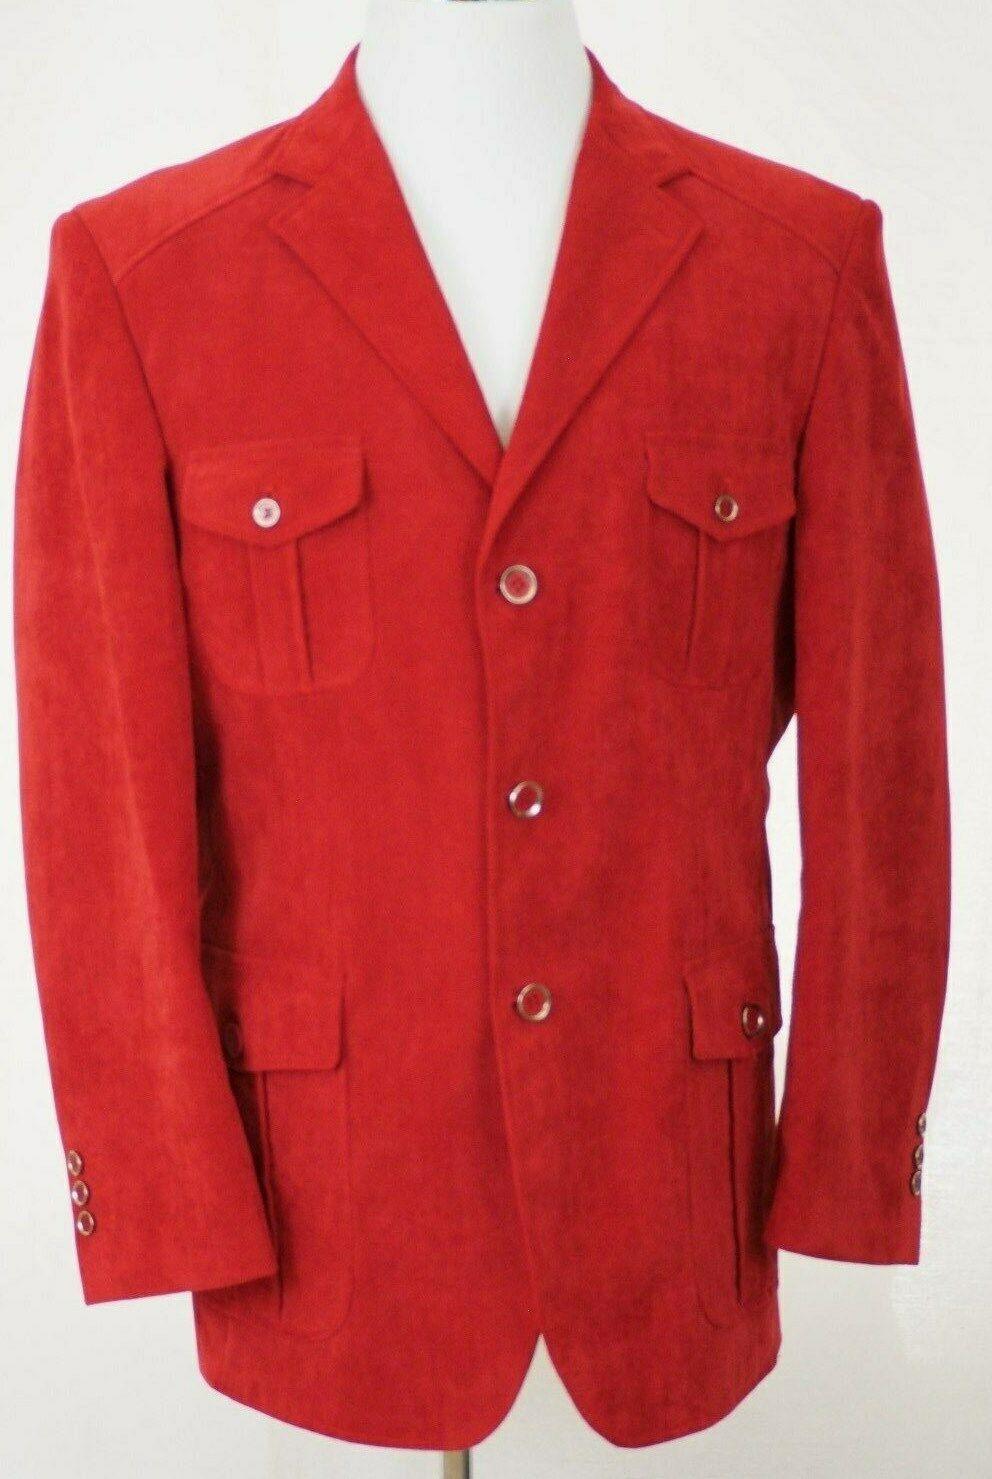 Men's Italian Style INSERCH Red Velvet Jacket Bla… - image 1